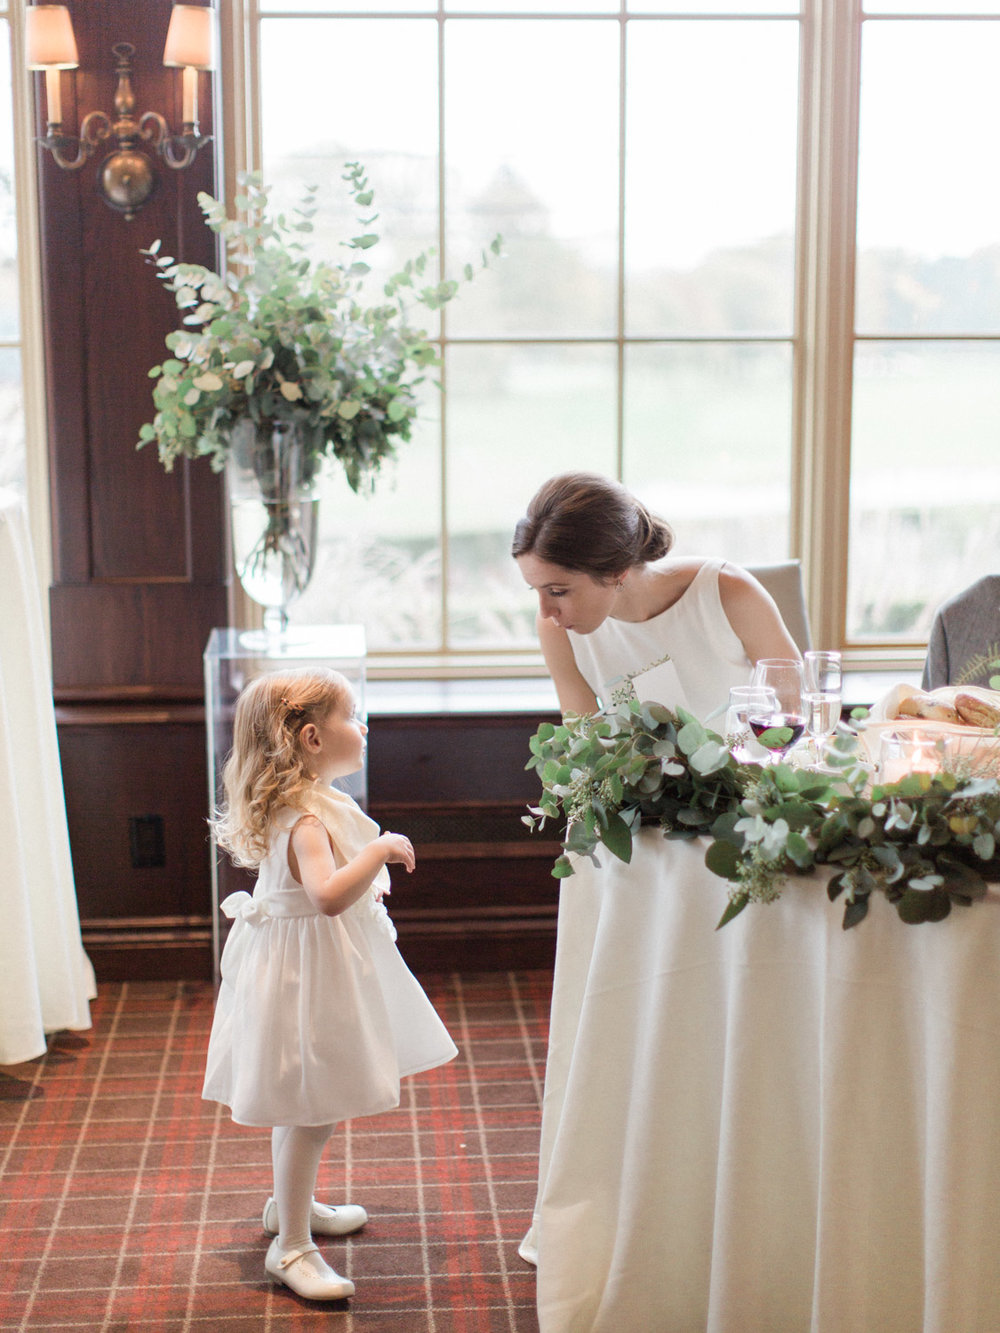 Toronto-wedding-photographer-st-georges-golf-club-jewish-modern-fall85.jpg